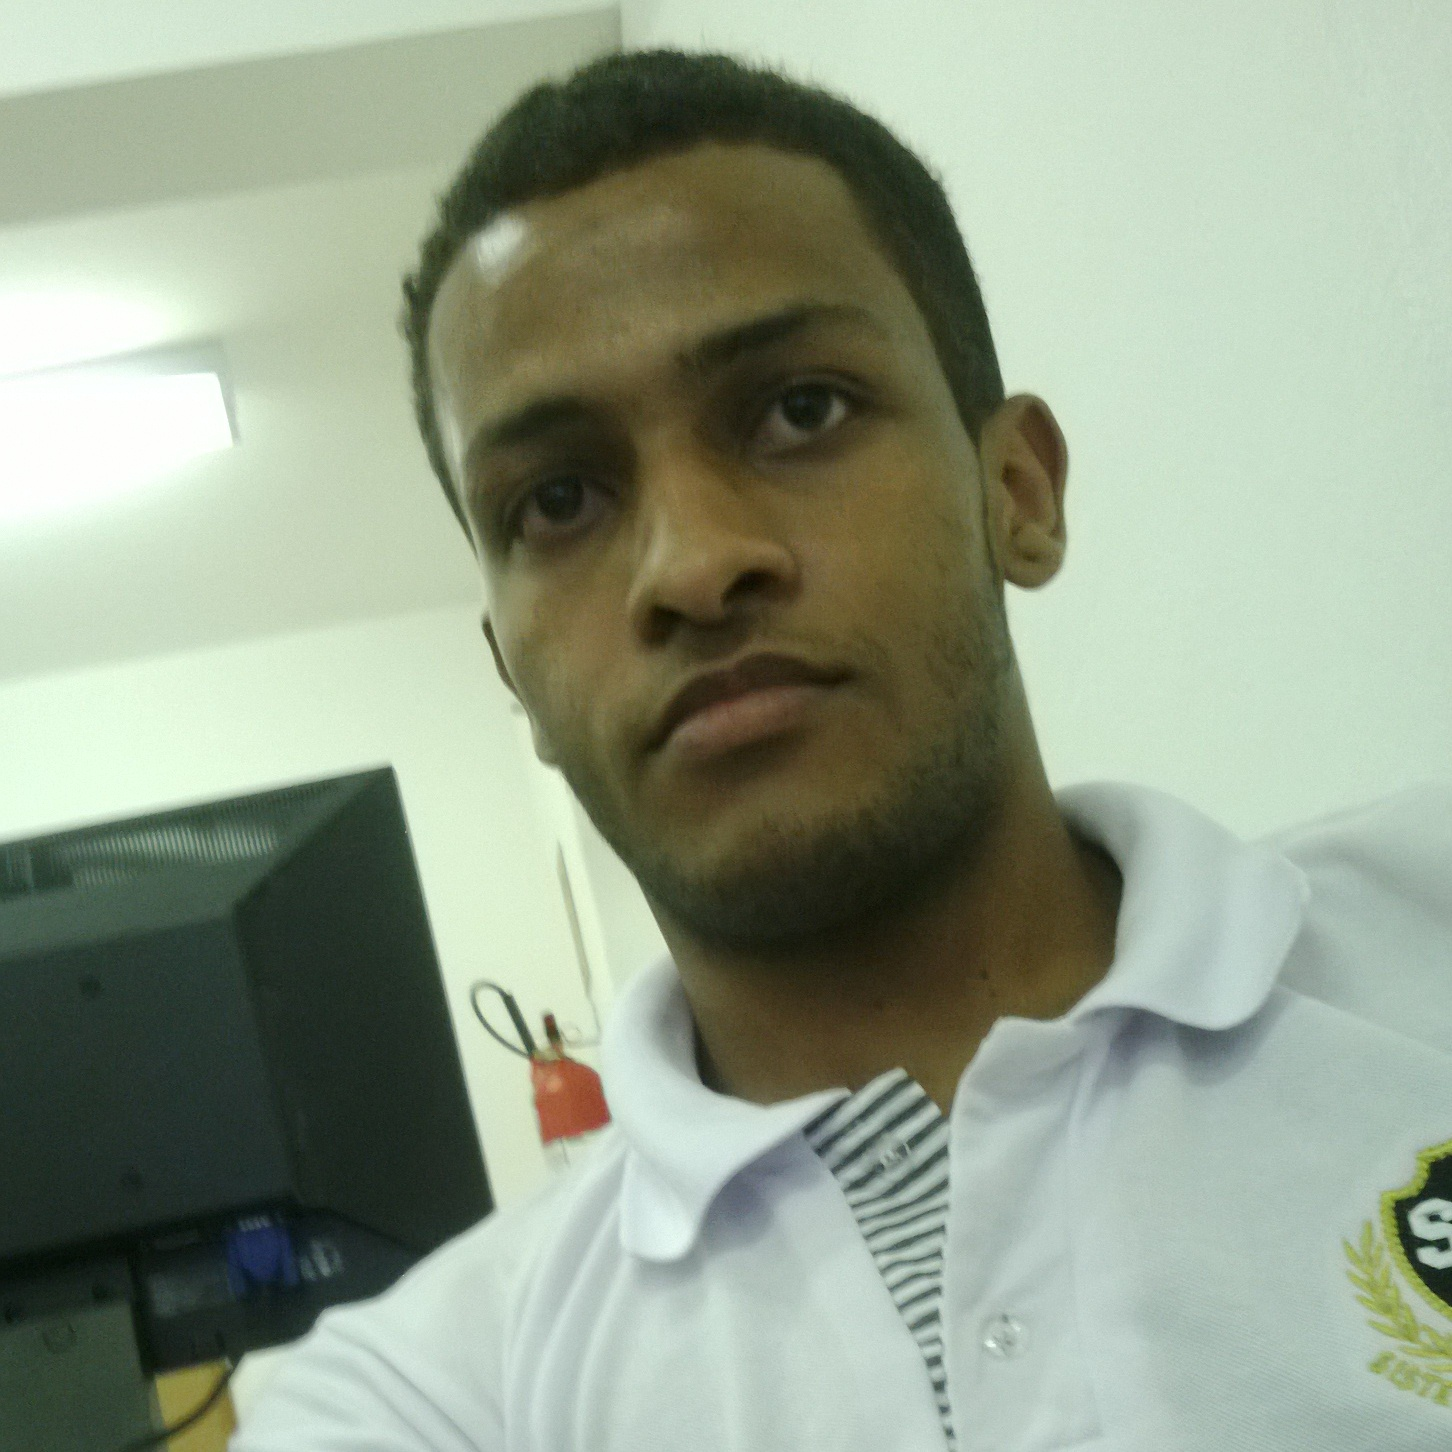 Angelo Antonio de Freitas Santos